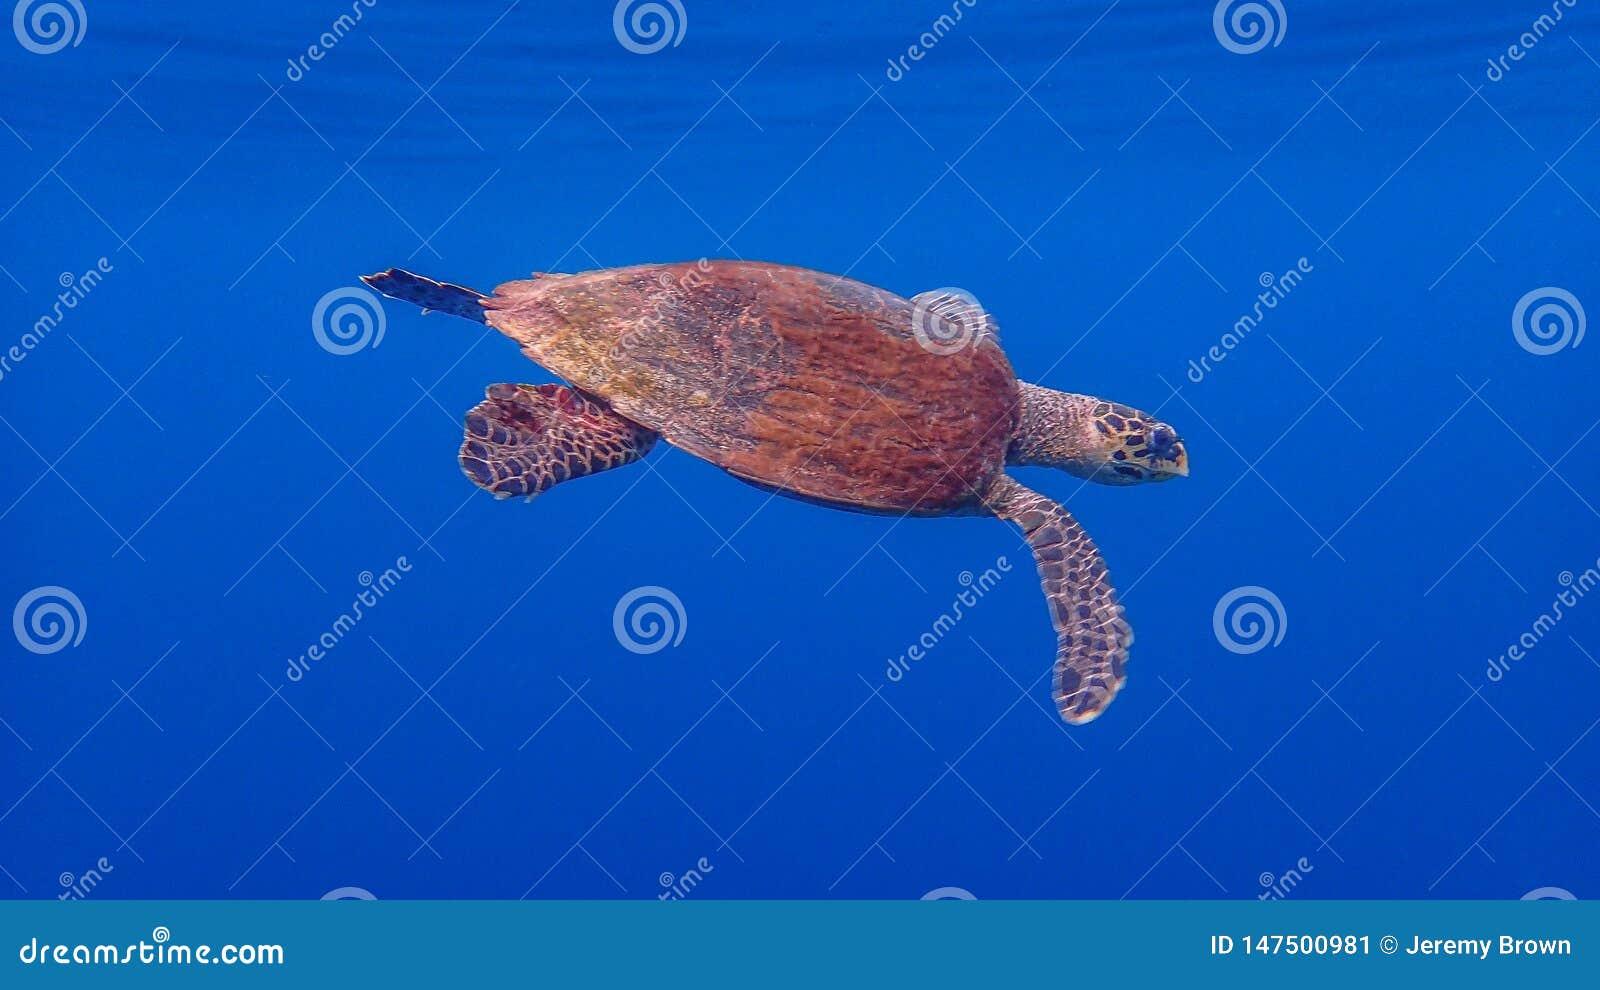 Hawksbill sea turtle, Eretmochelys imbricata. Blue water background, Raja Ampat